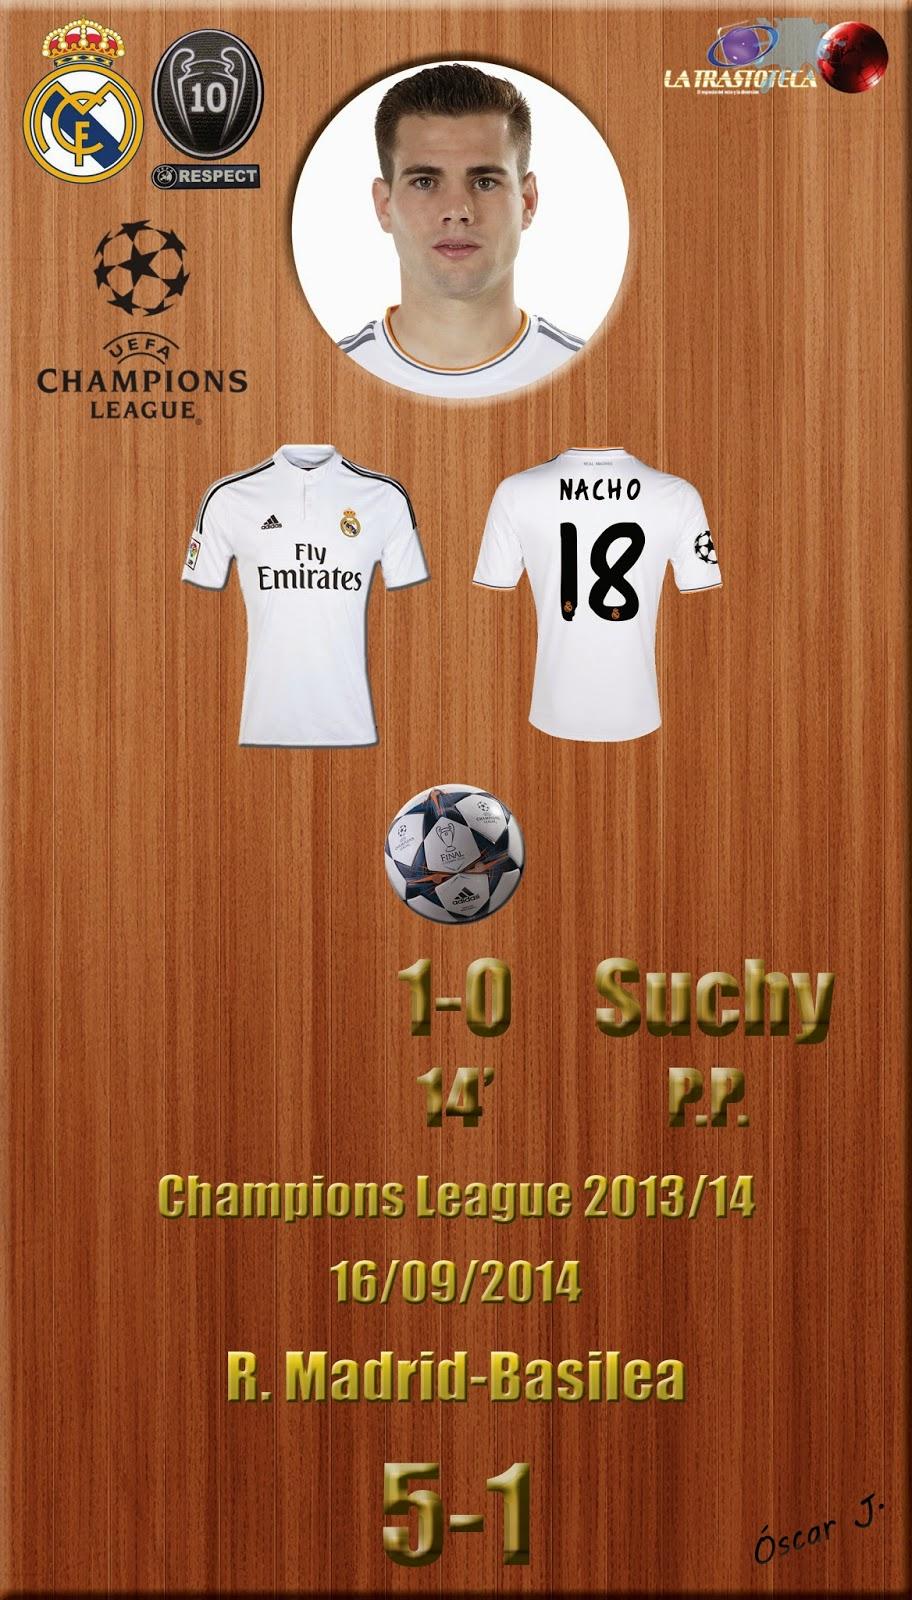 Nacho (1-0) (Gol concedido a Suchy en propia puerta) - Champions League. Jornada 1 (16/09/2014)